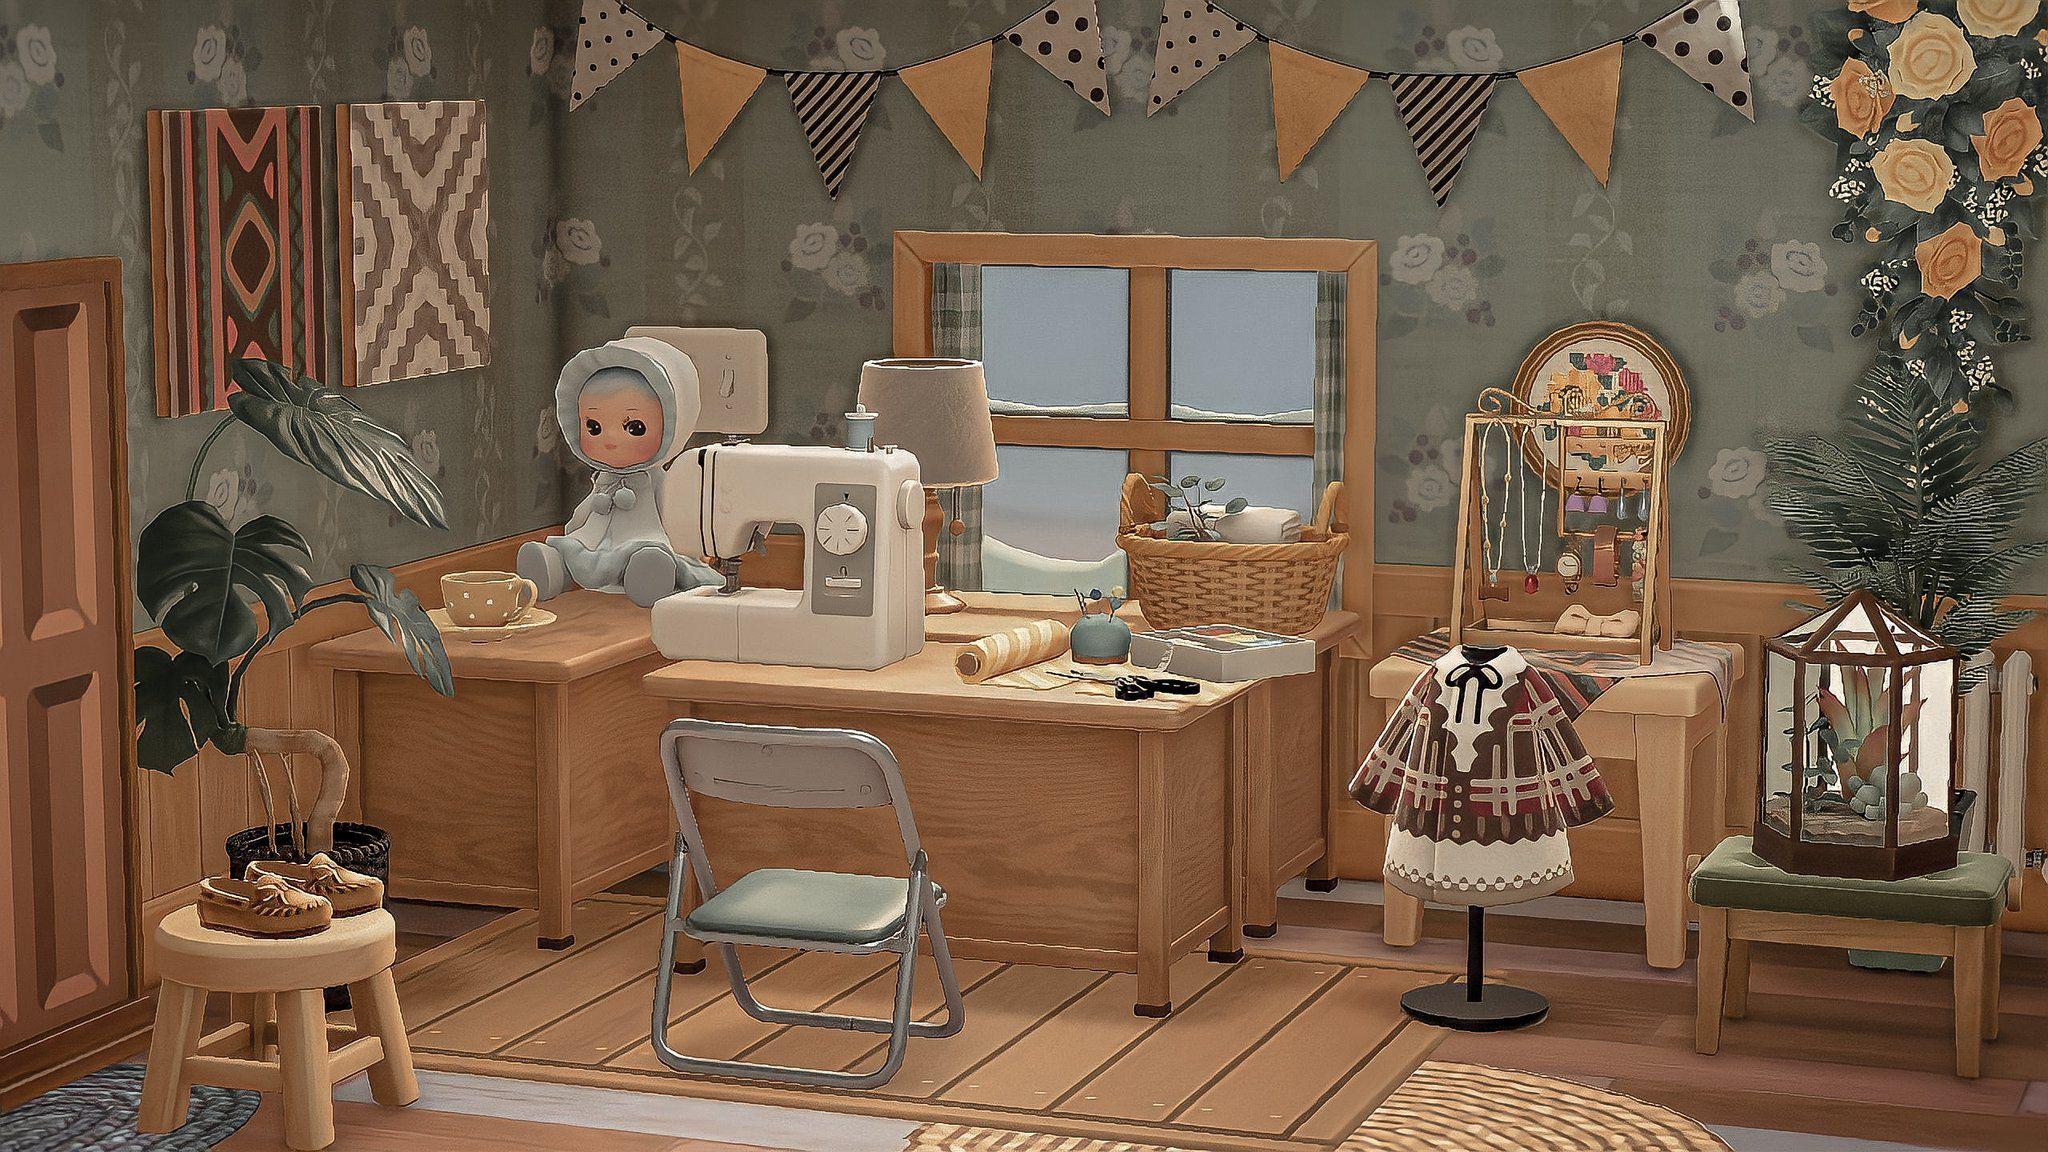 Nadine On Twitter Animal Crossing Animal Crossing Wild World Animal Crossing Game Acnh antique bedroom ideas